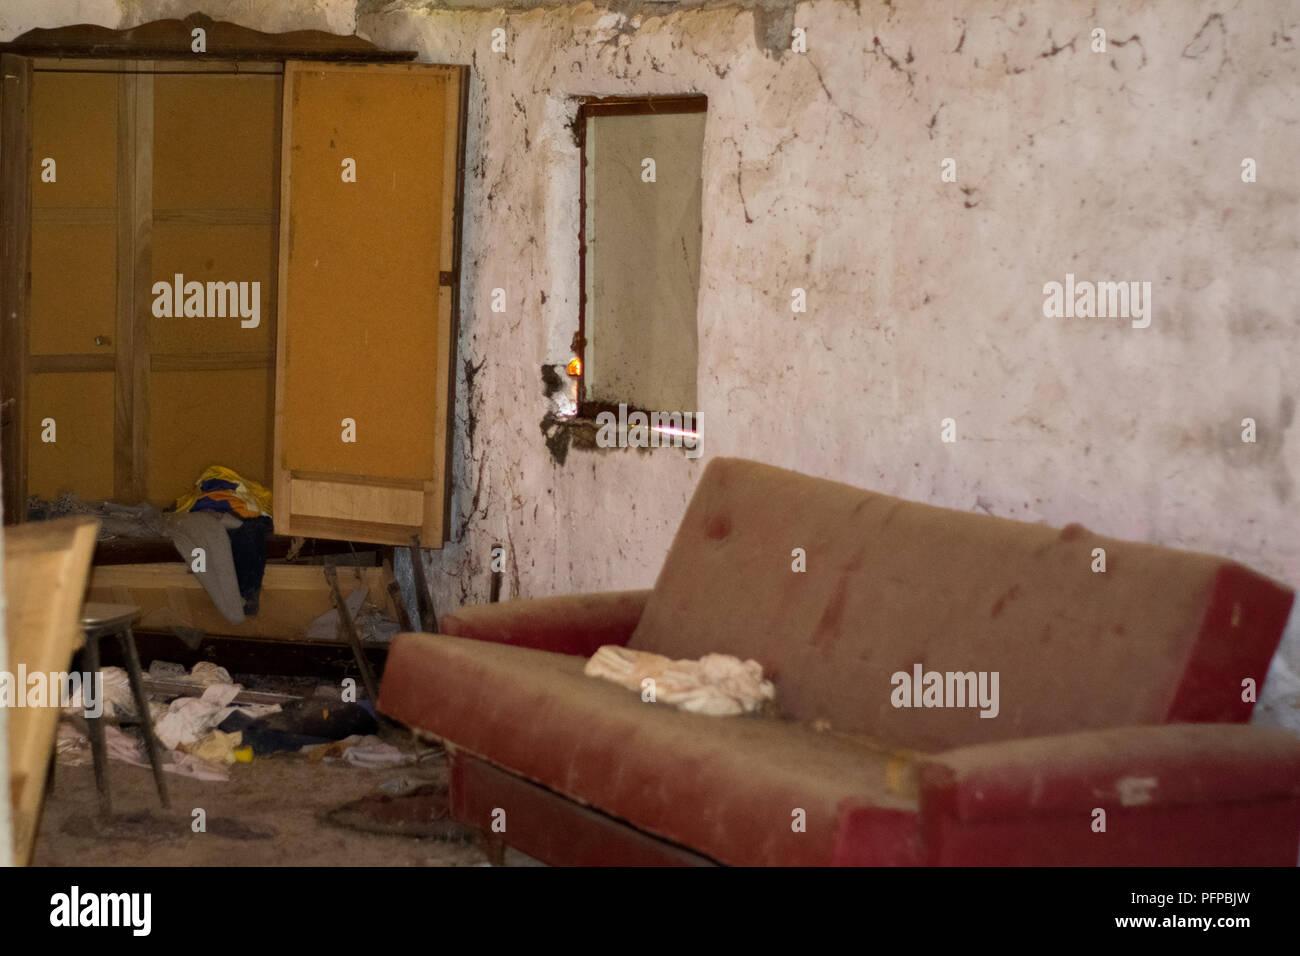 Abandoned places - Stock Image